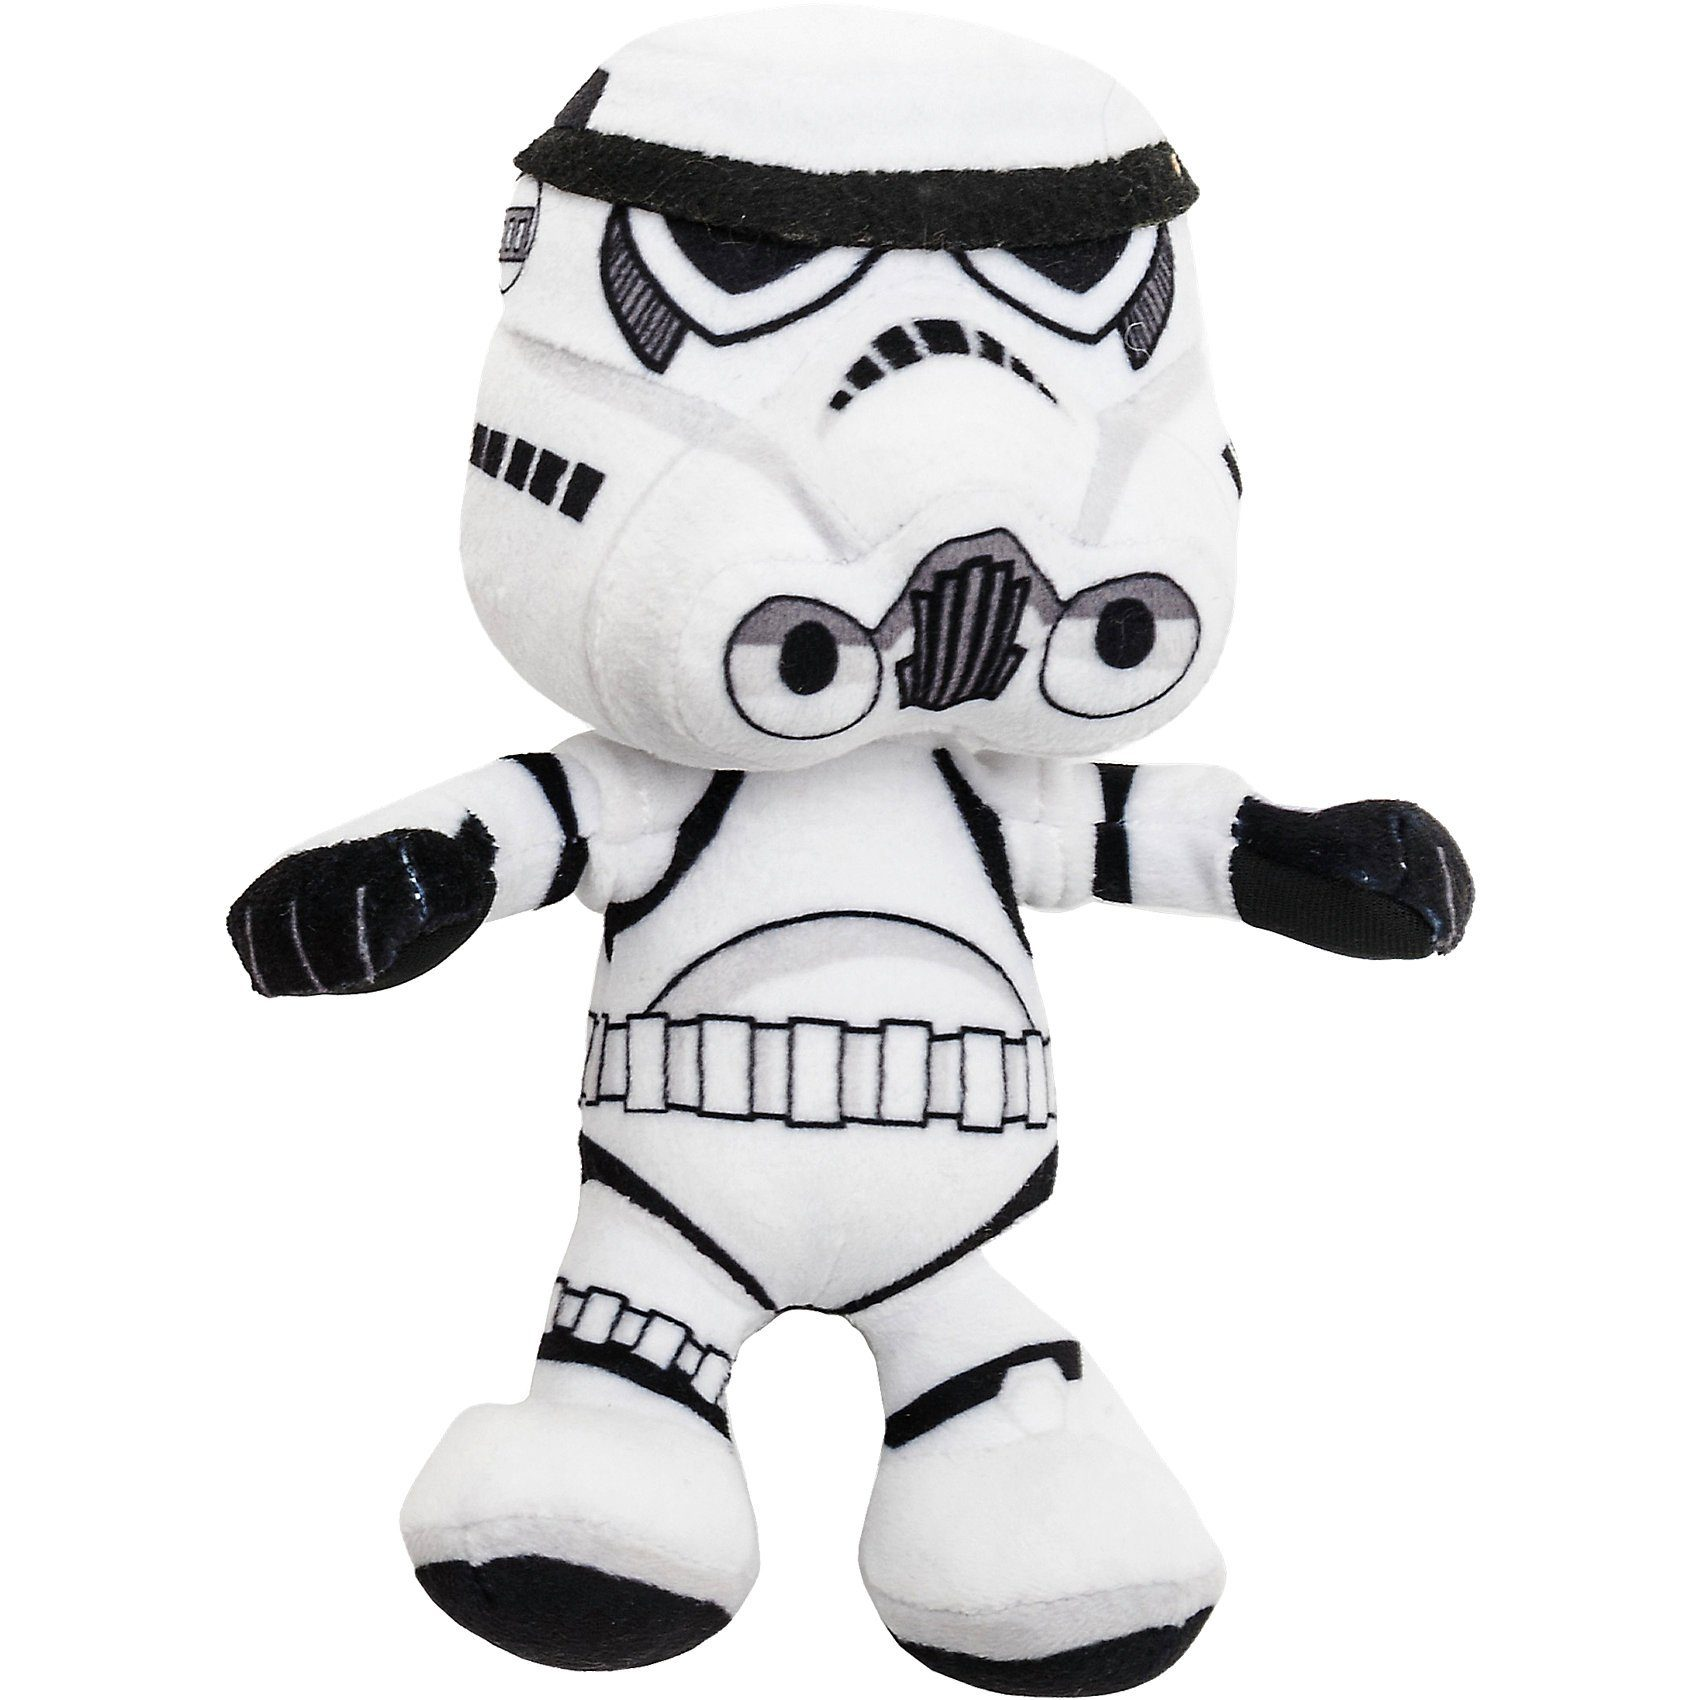 JOY TOY Velboa-Samtplüsch Storm Trooper Star Wars, 20 cm